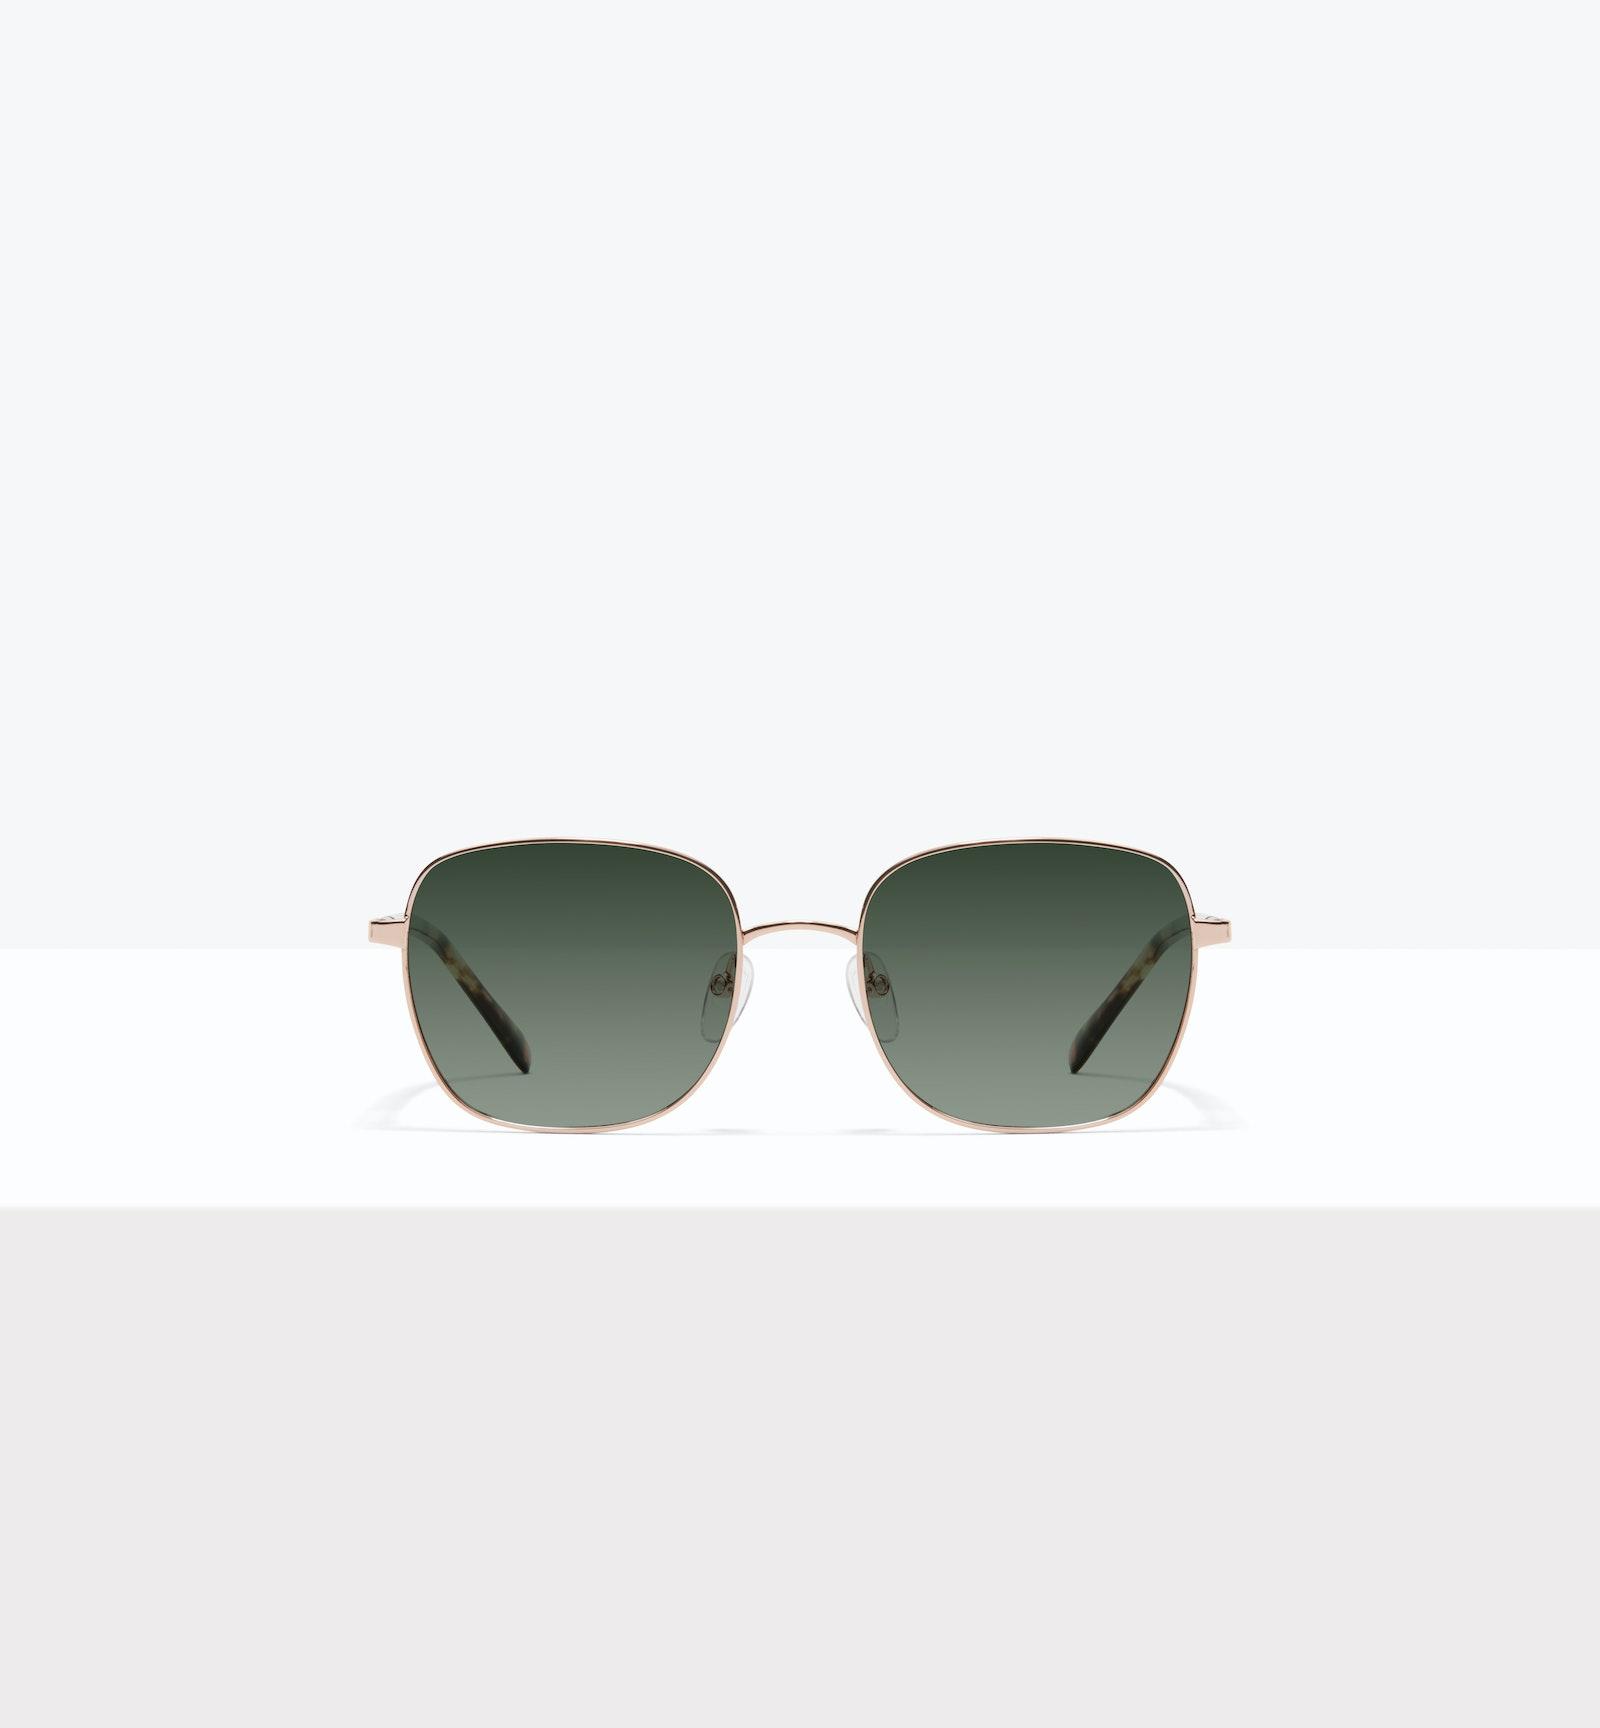 Affordable Fashion Glasses Square Sunglasses Women Henriette M Rose Gold